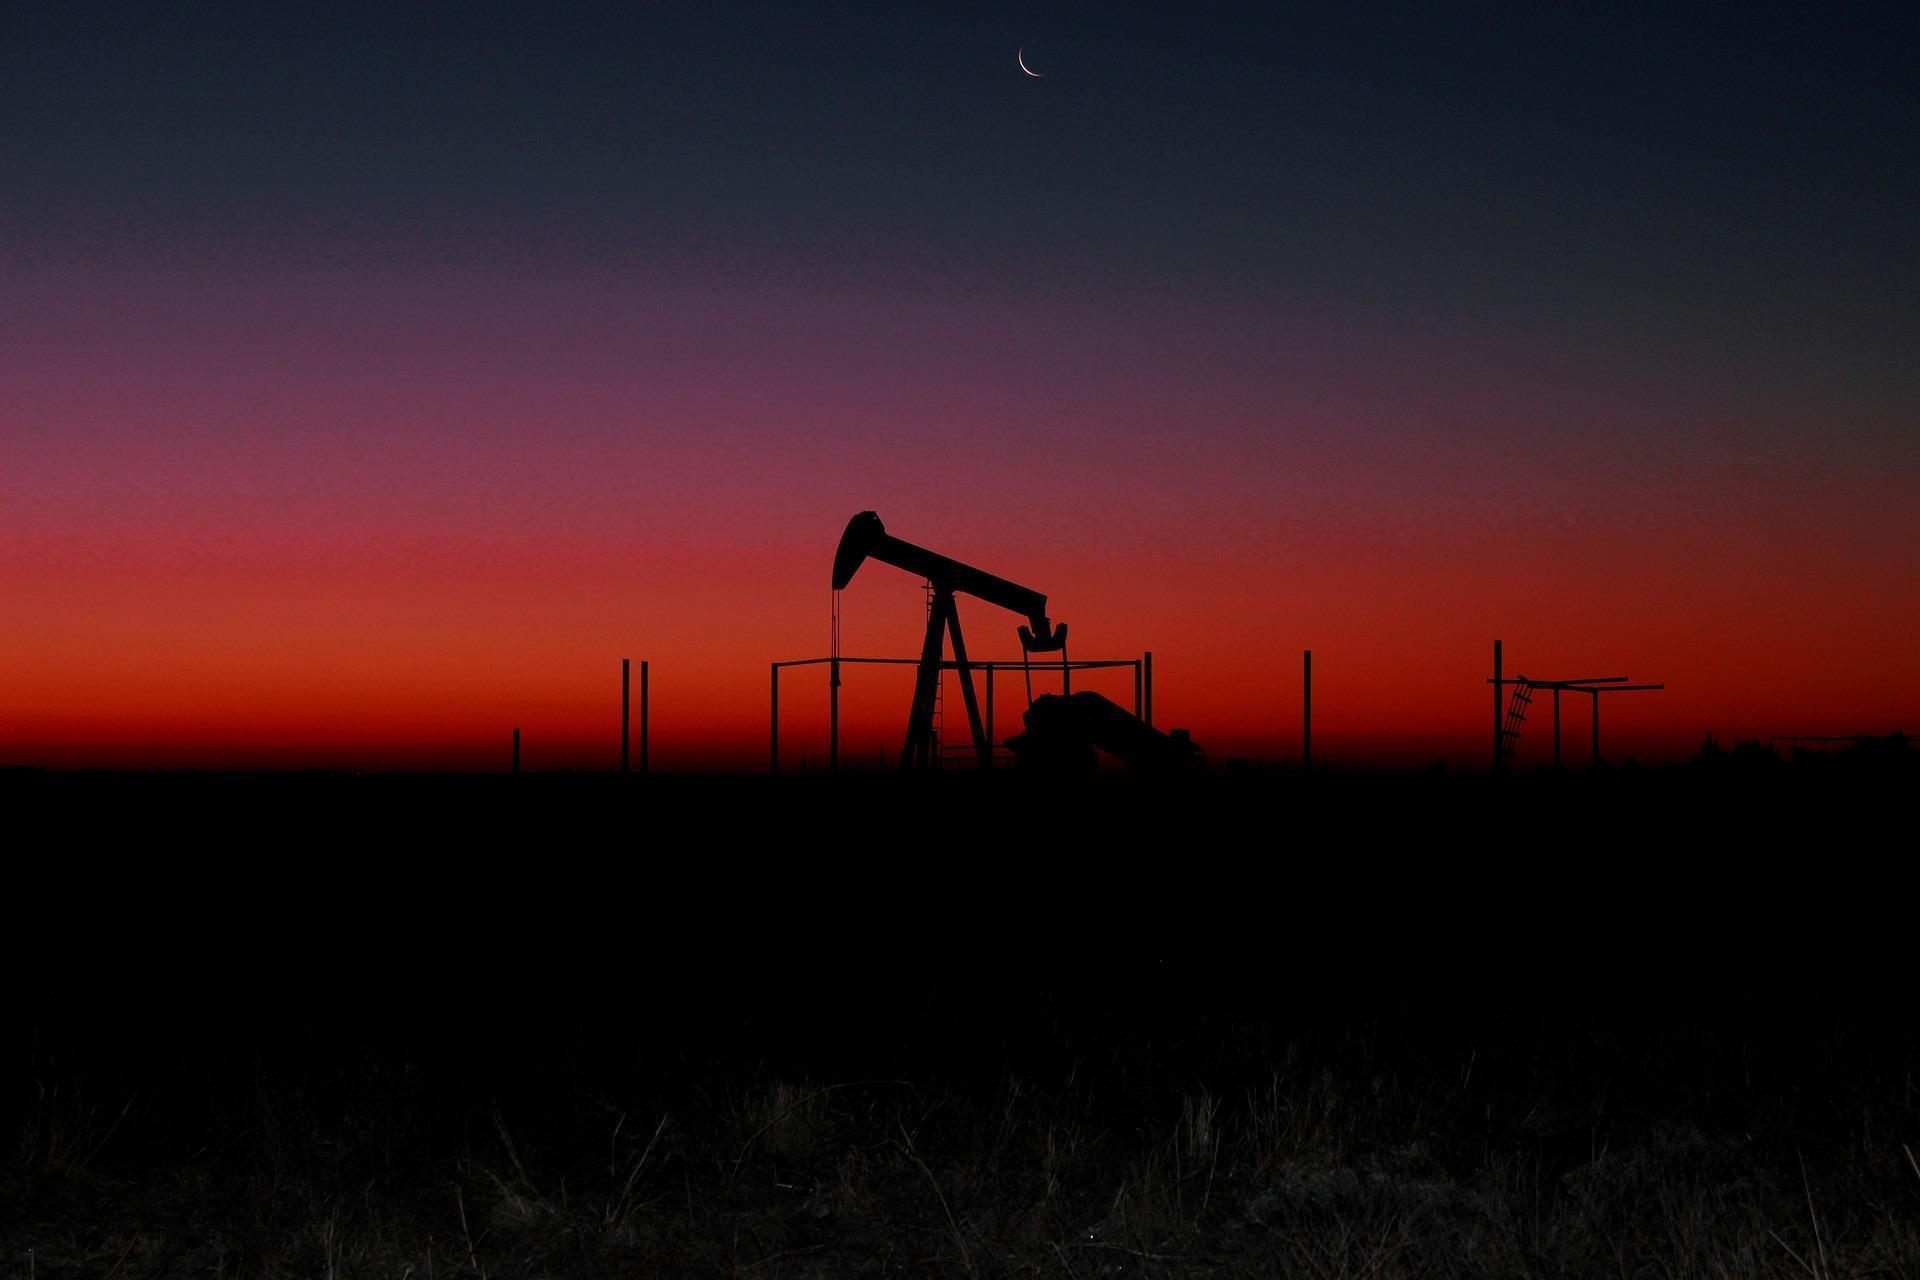 Цена нефти Brent упала ниже $41 из-за опасений второй волны коронавируса